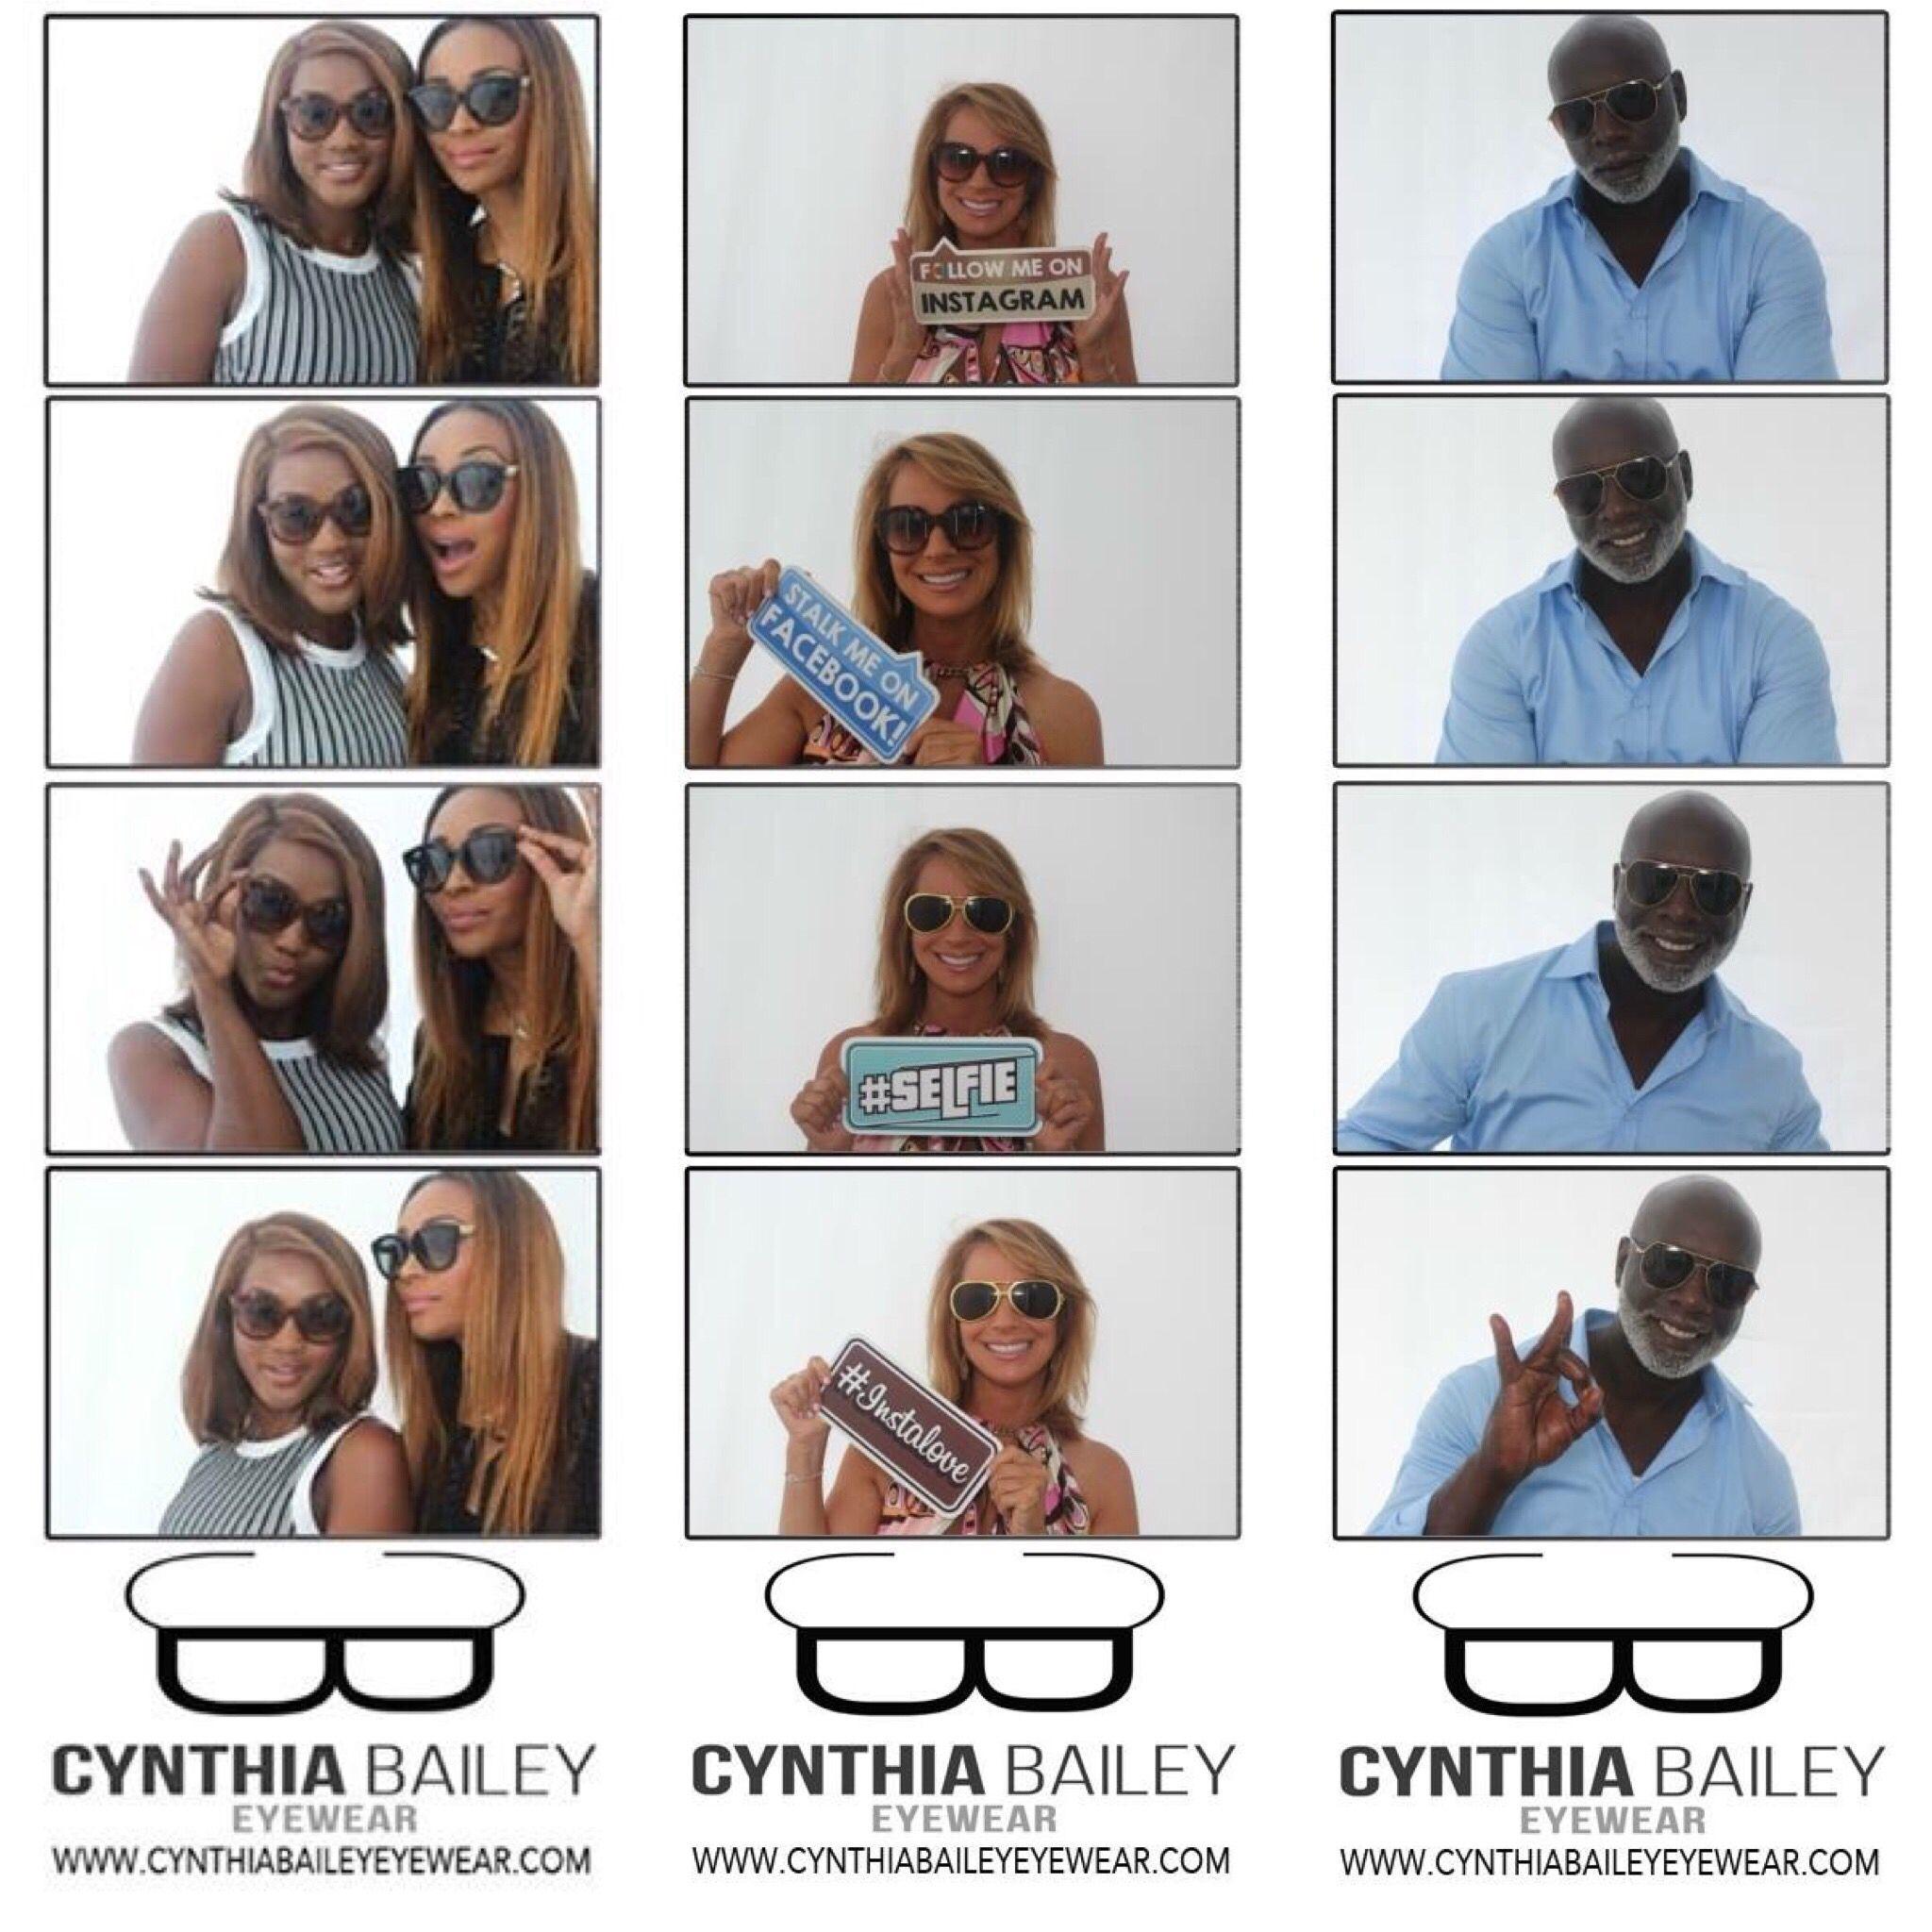 Cynthia Bailey Eyewear Photo Booth strips.